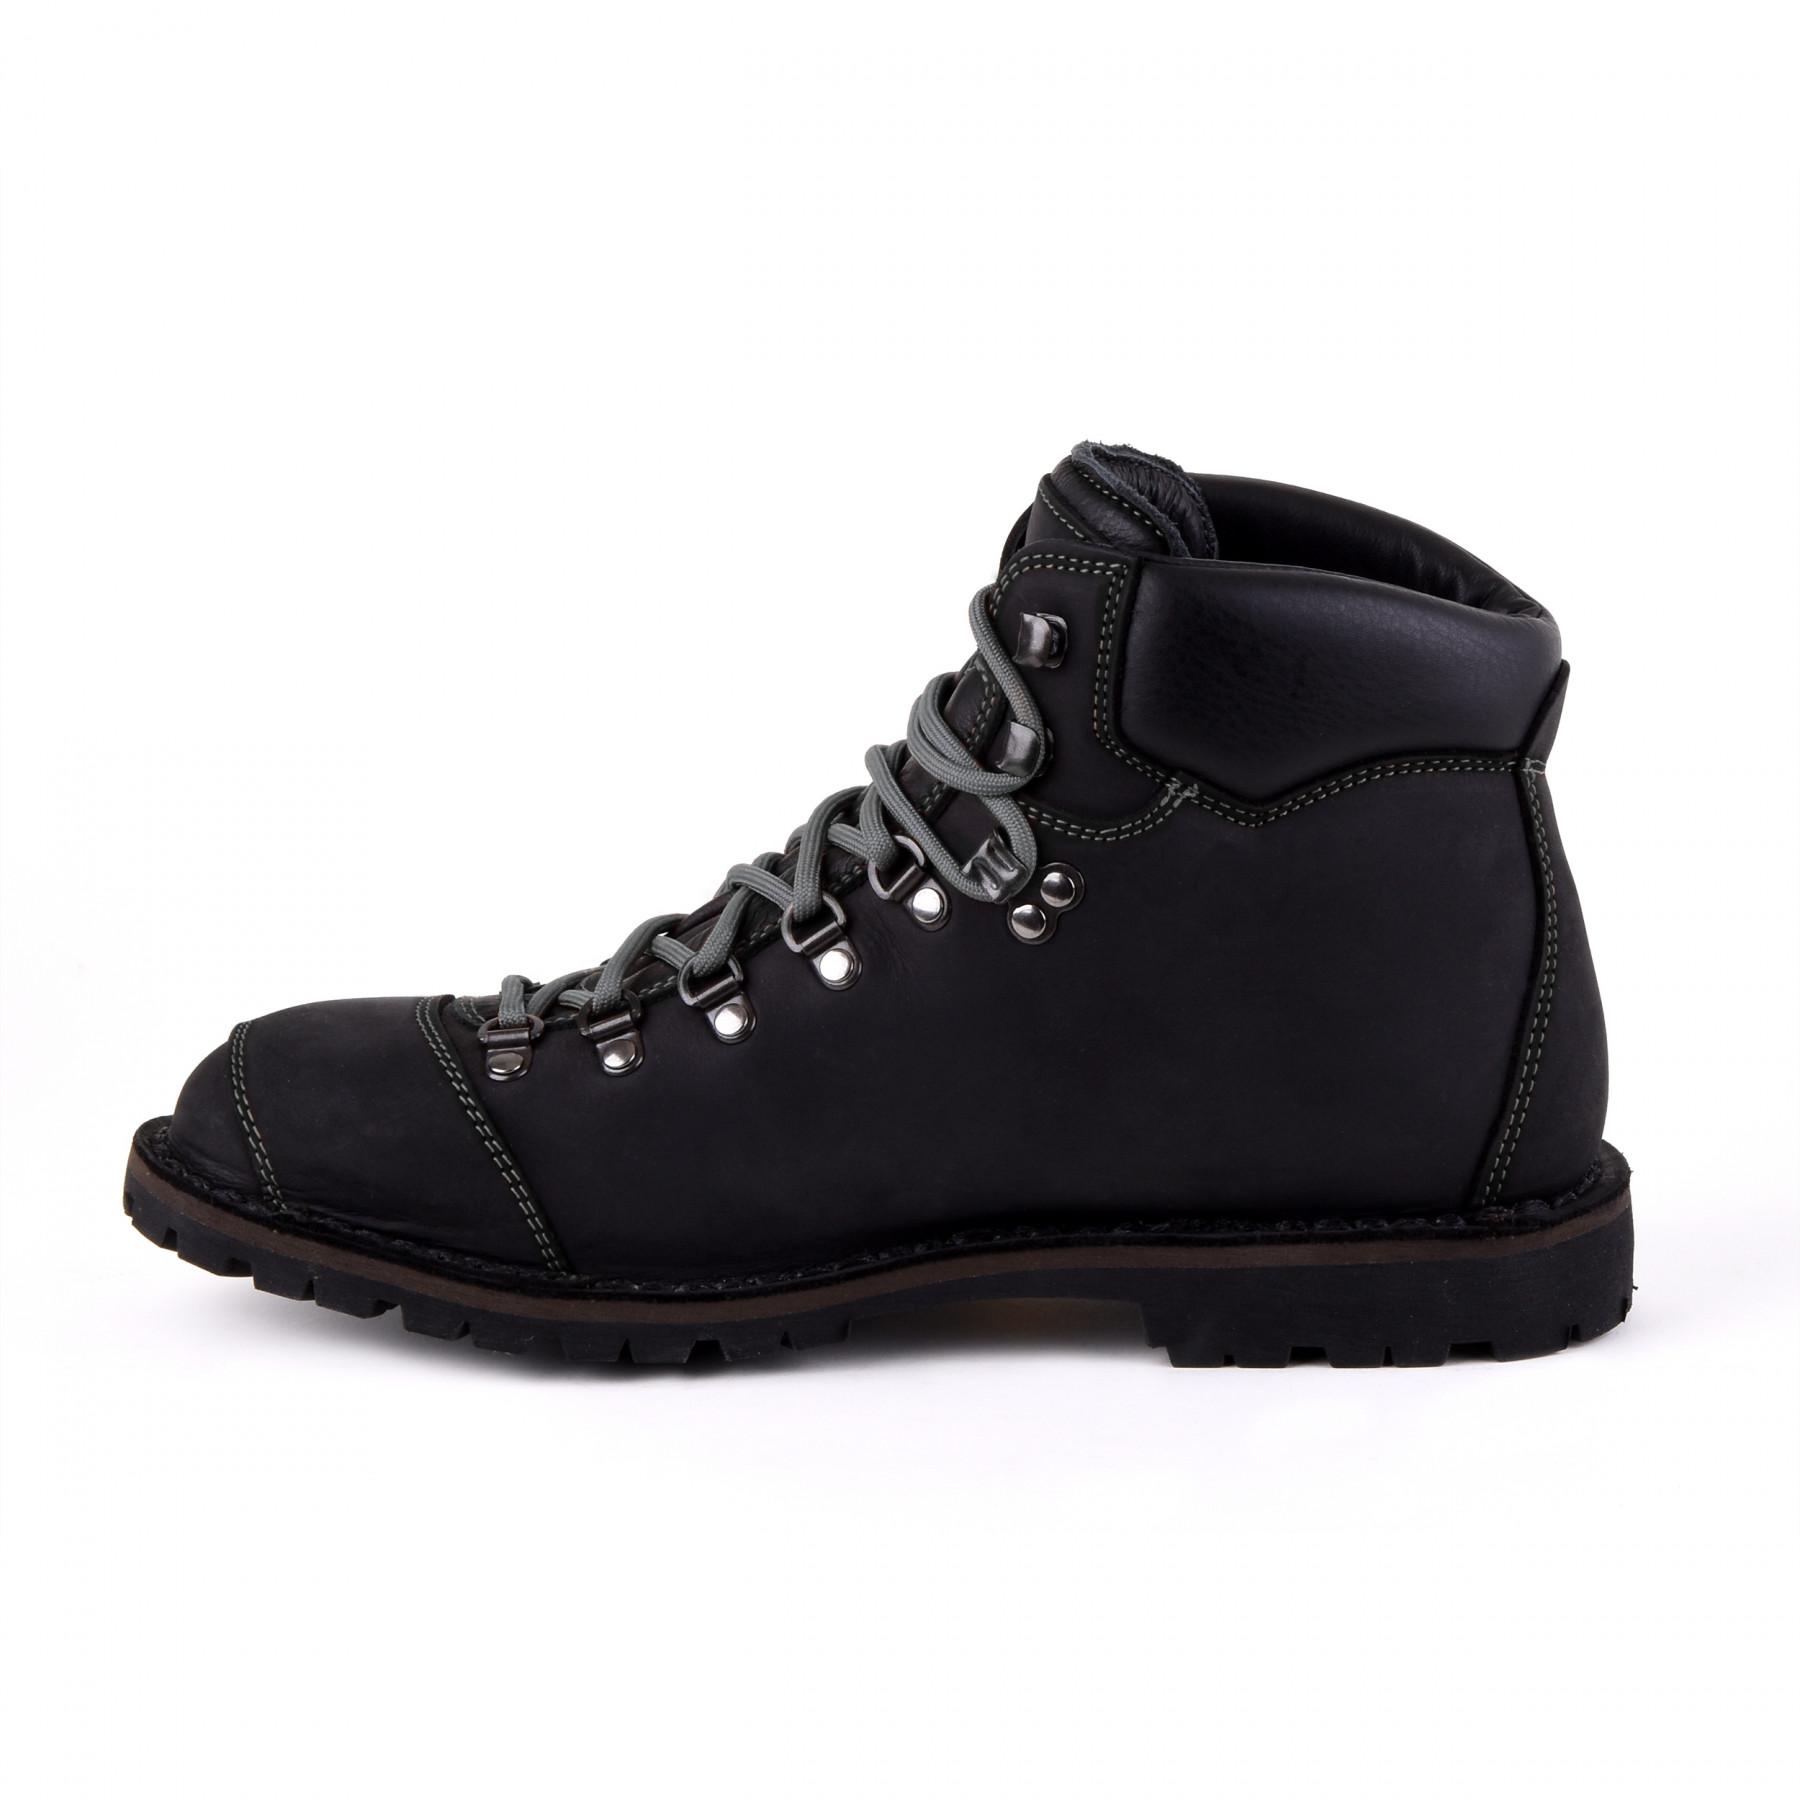 Biker Boot Adventure Denver Black, black gents boot, grey stitching